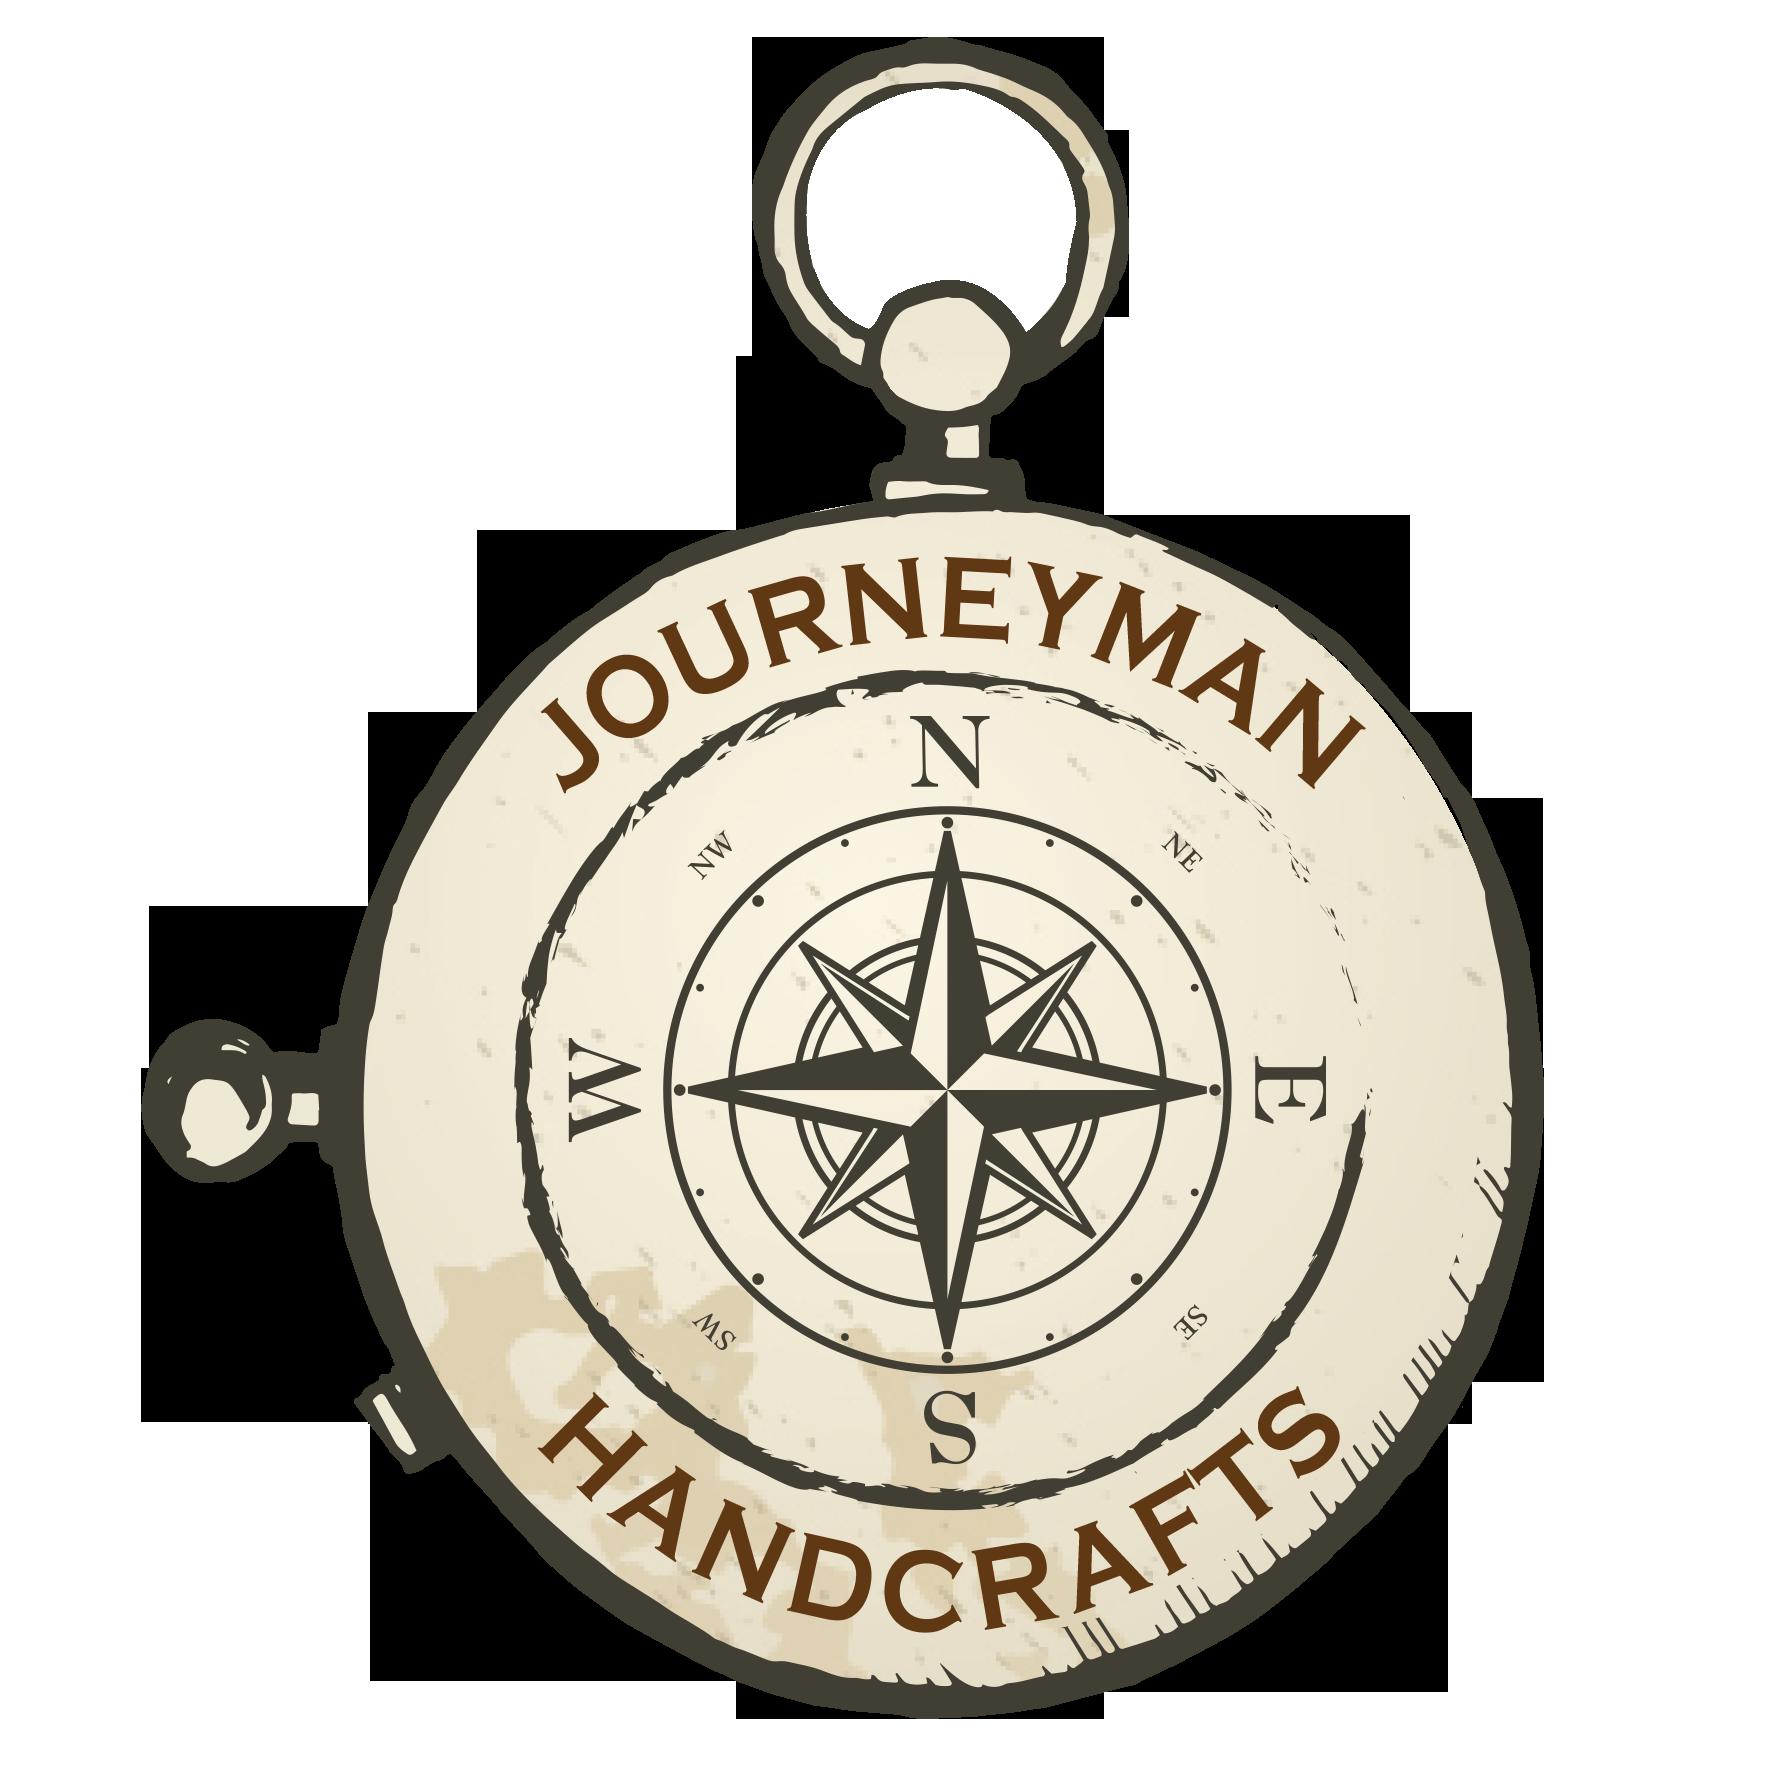 Journeyman-Handcraft-Logo-Transparent.png